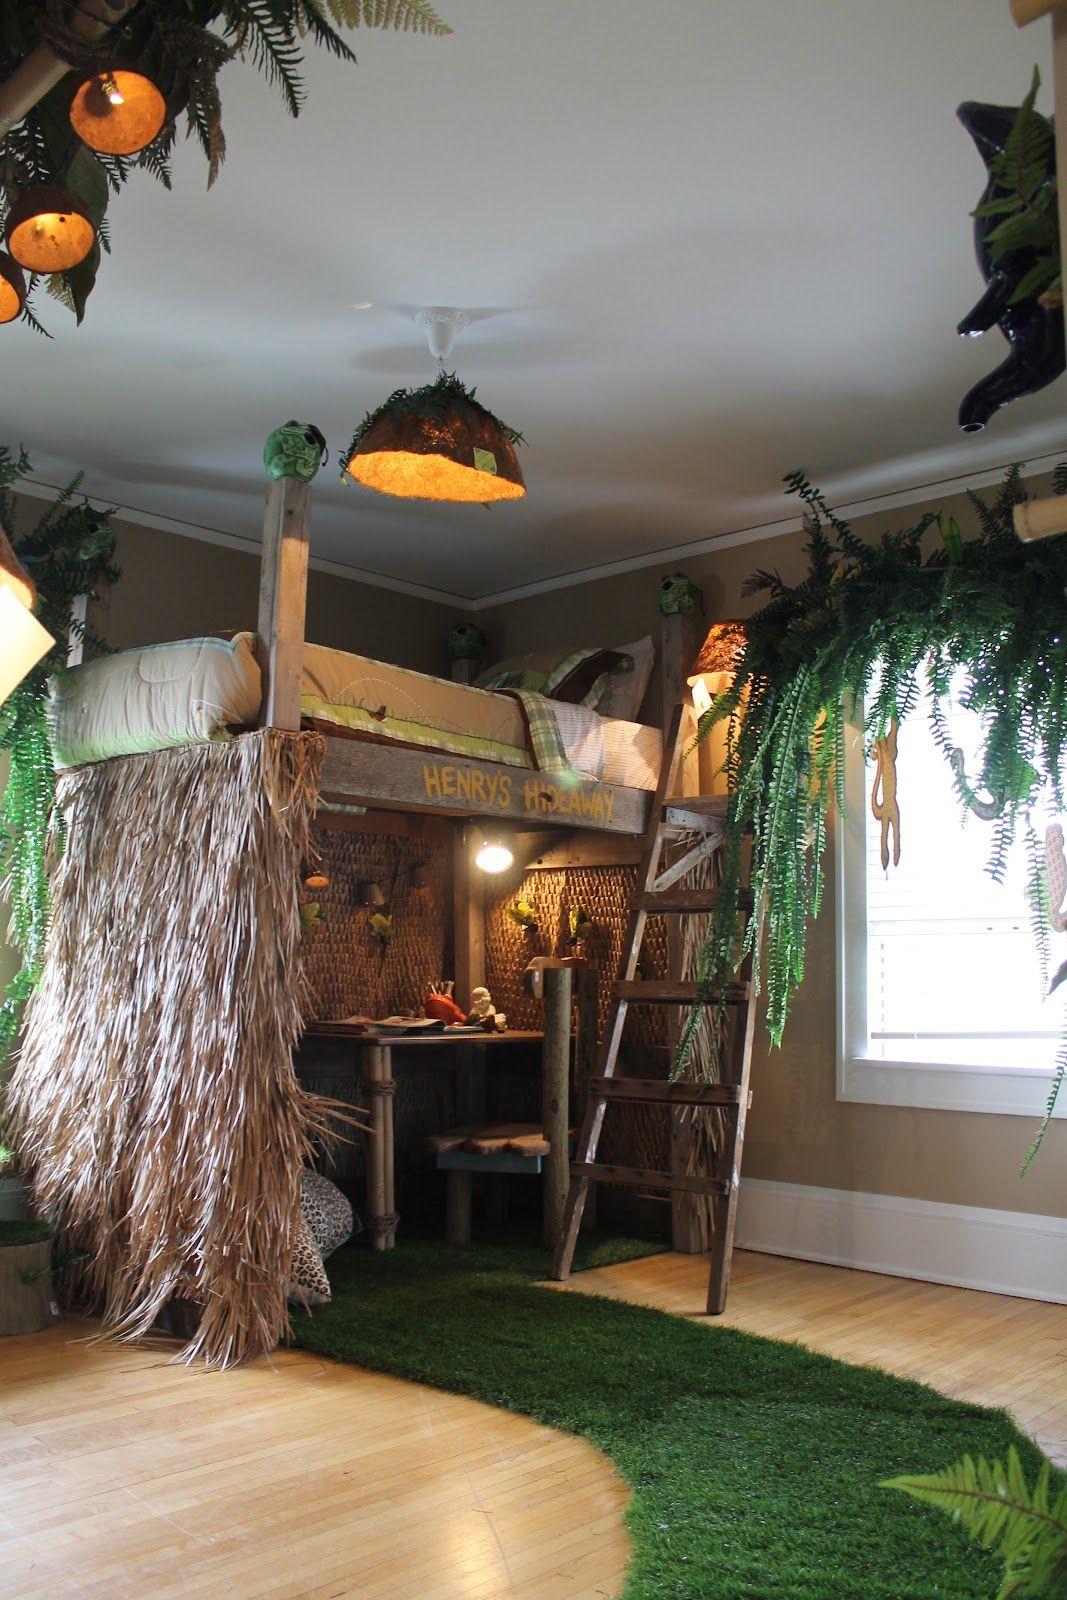 Boys Jungle Bedroom: Hammers and High Heels: Head Over Heels